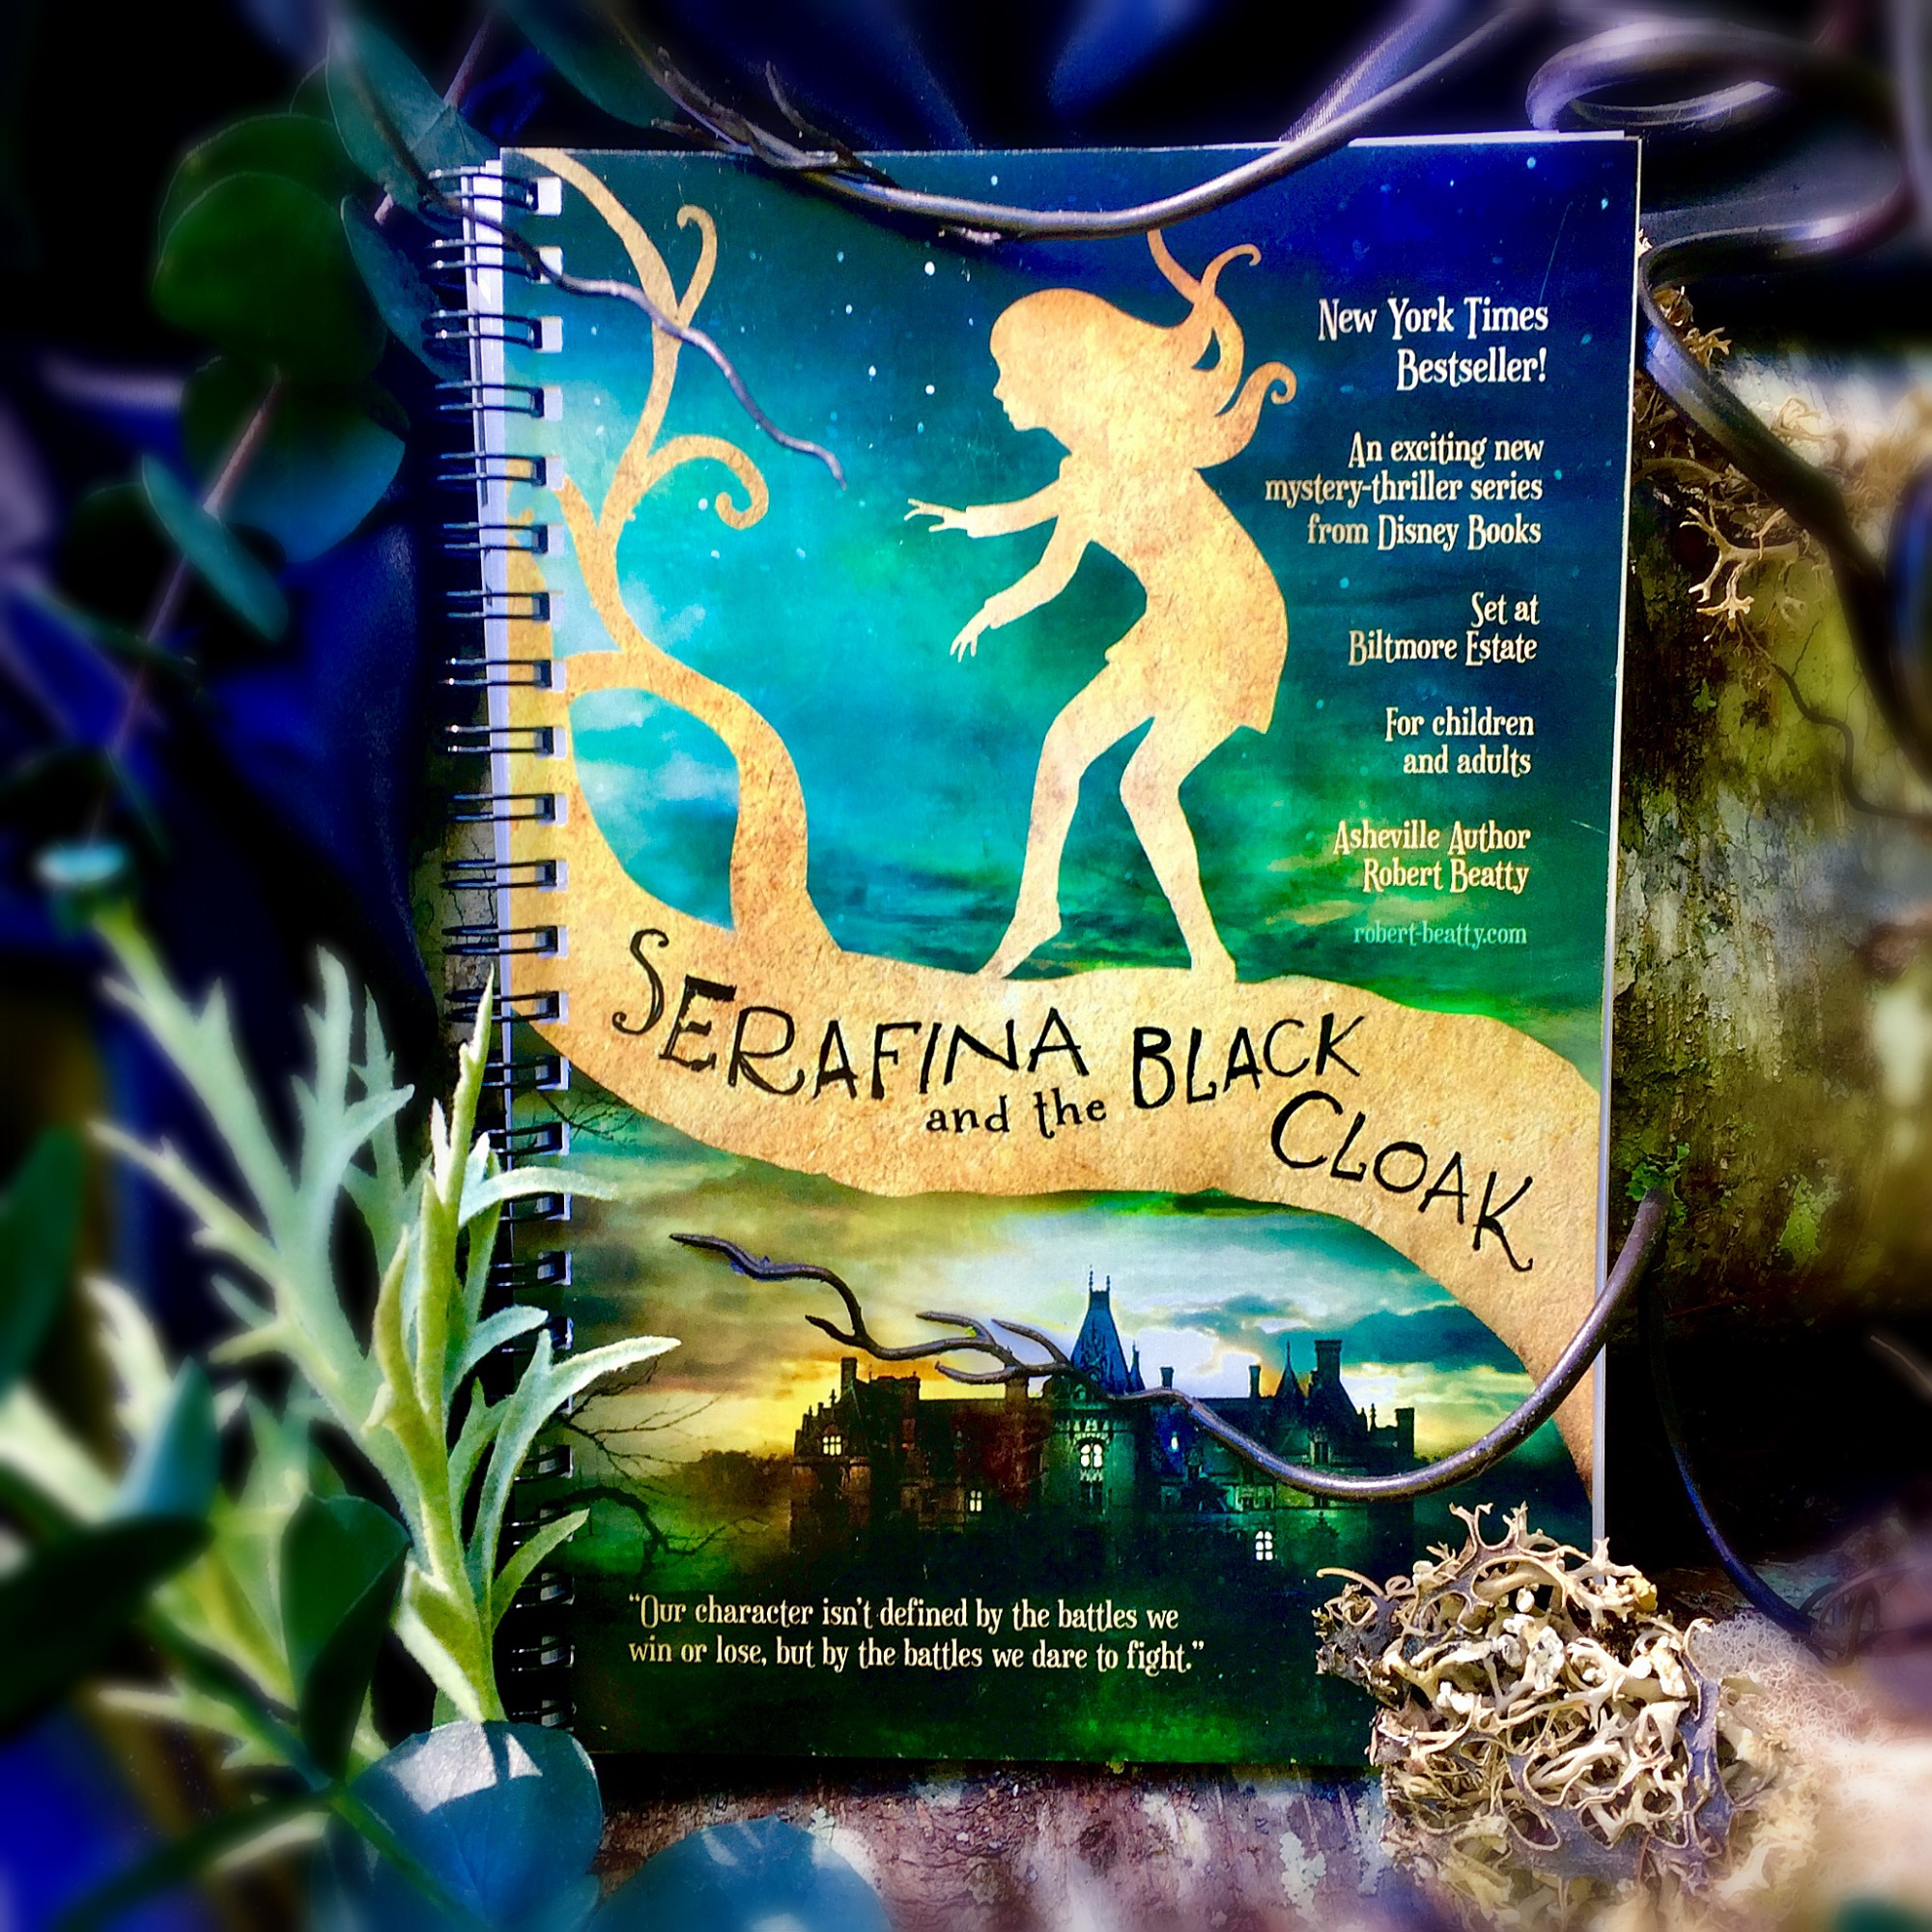 serafina-and-the-black-cloak-robert-beatty-biltmore-asheville-appalachian-disney-hyperion-2